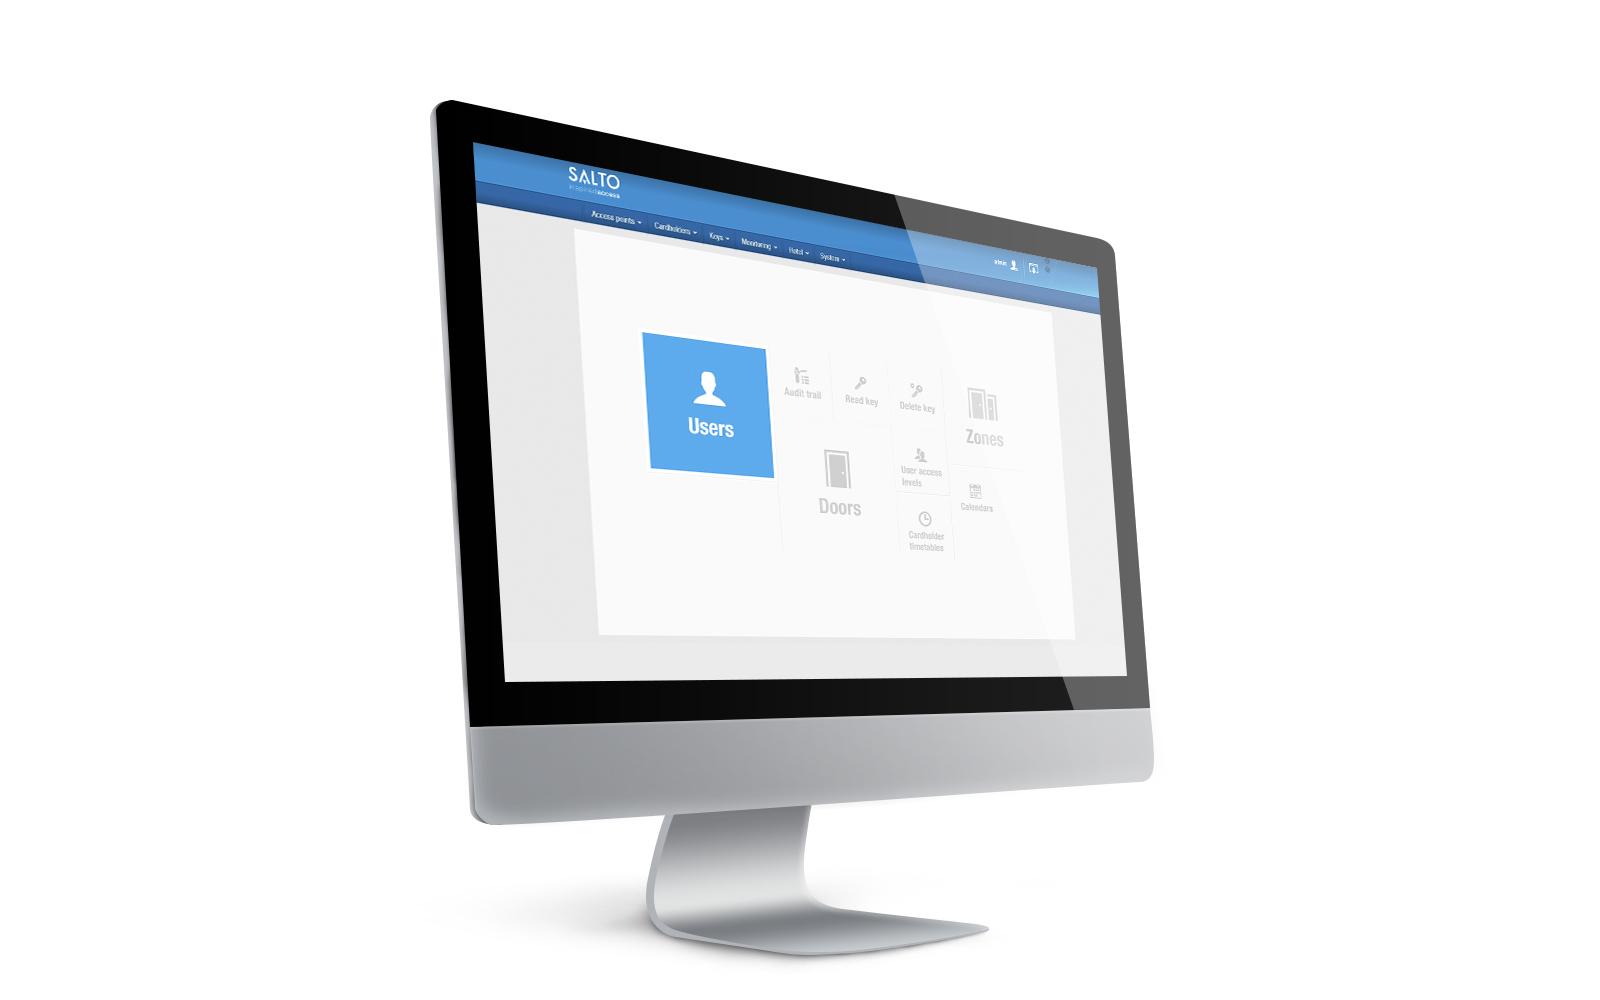 SALTO - ProAccess SPACE Software - Funktion: Standort/Funktionsmatrix - SPACE-OPT-0015